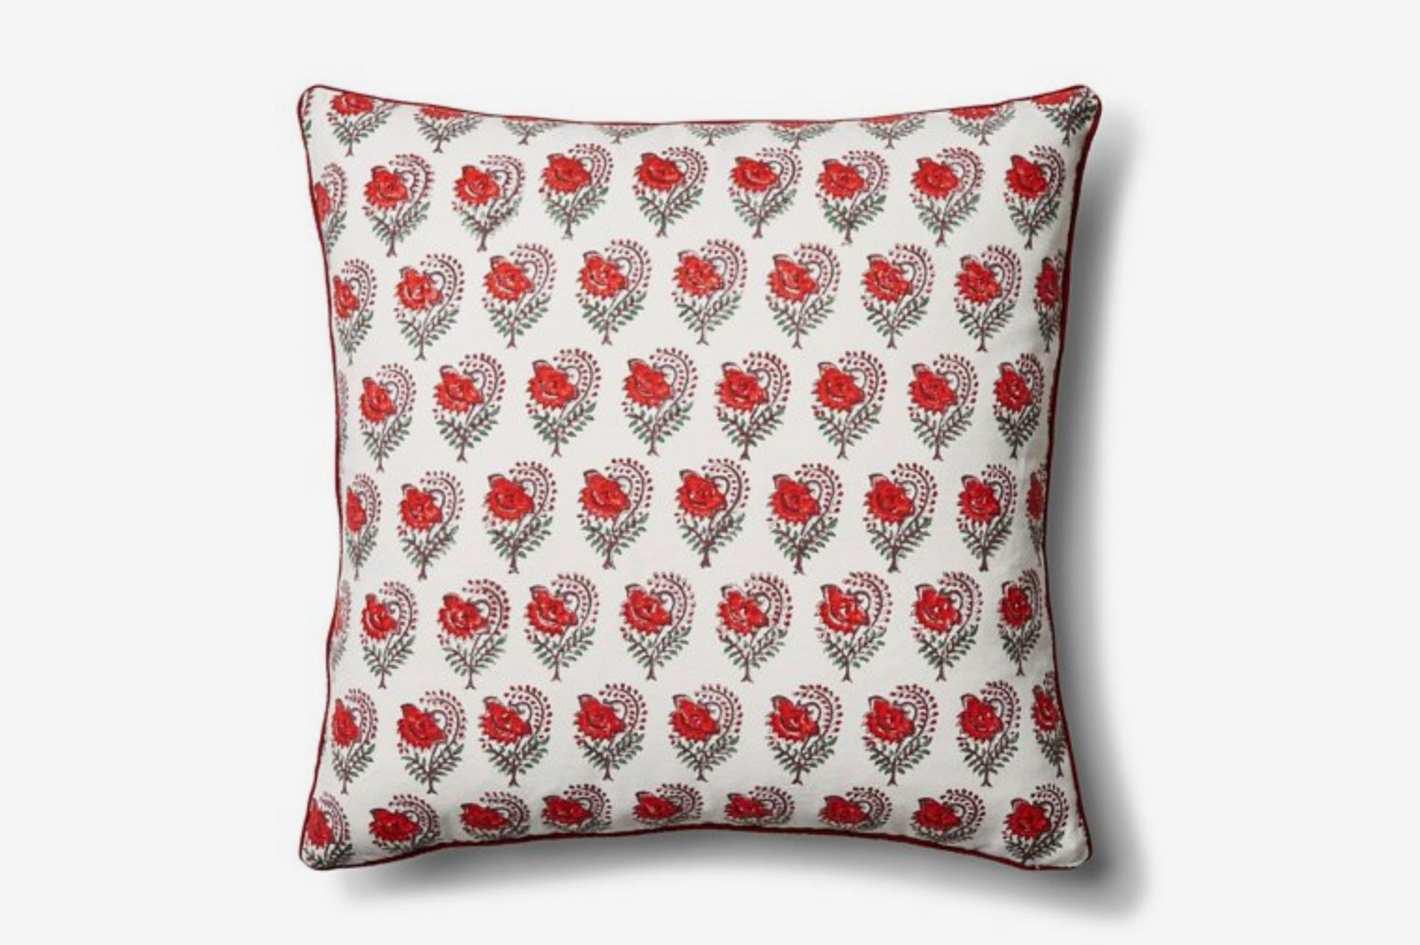 Roller Rabbit Ketaki 22x22 Pillow